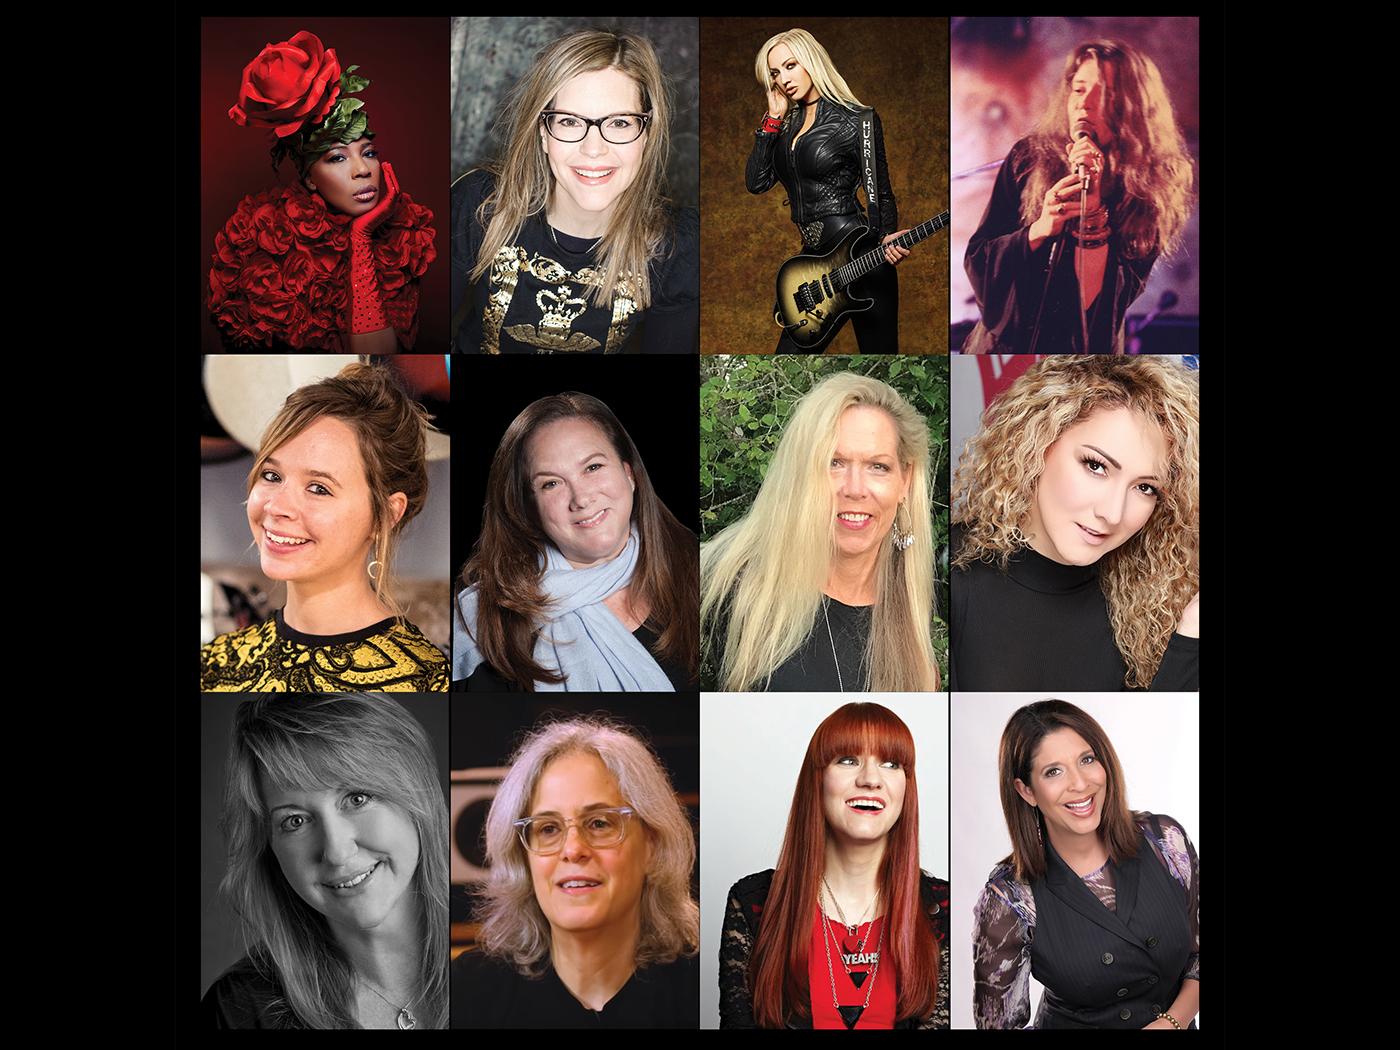 Nita Strauss, Janis Joplin and more to be honoured at 2019 She Rocks Awards